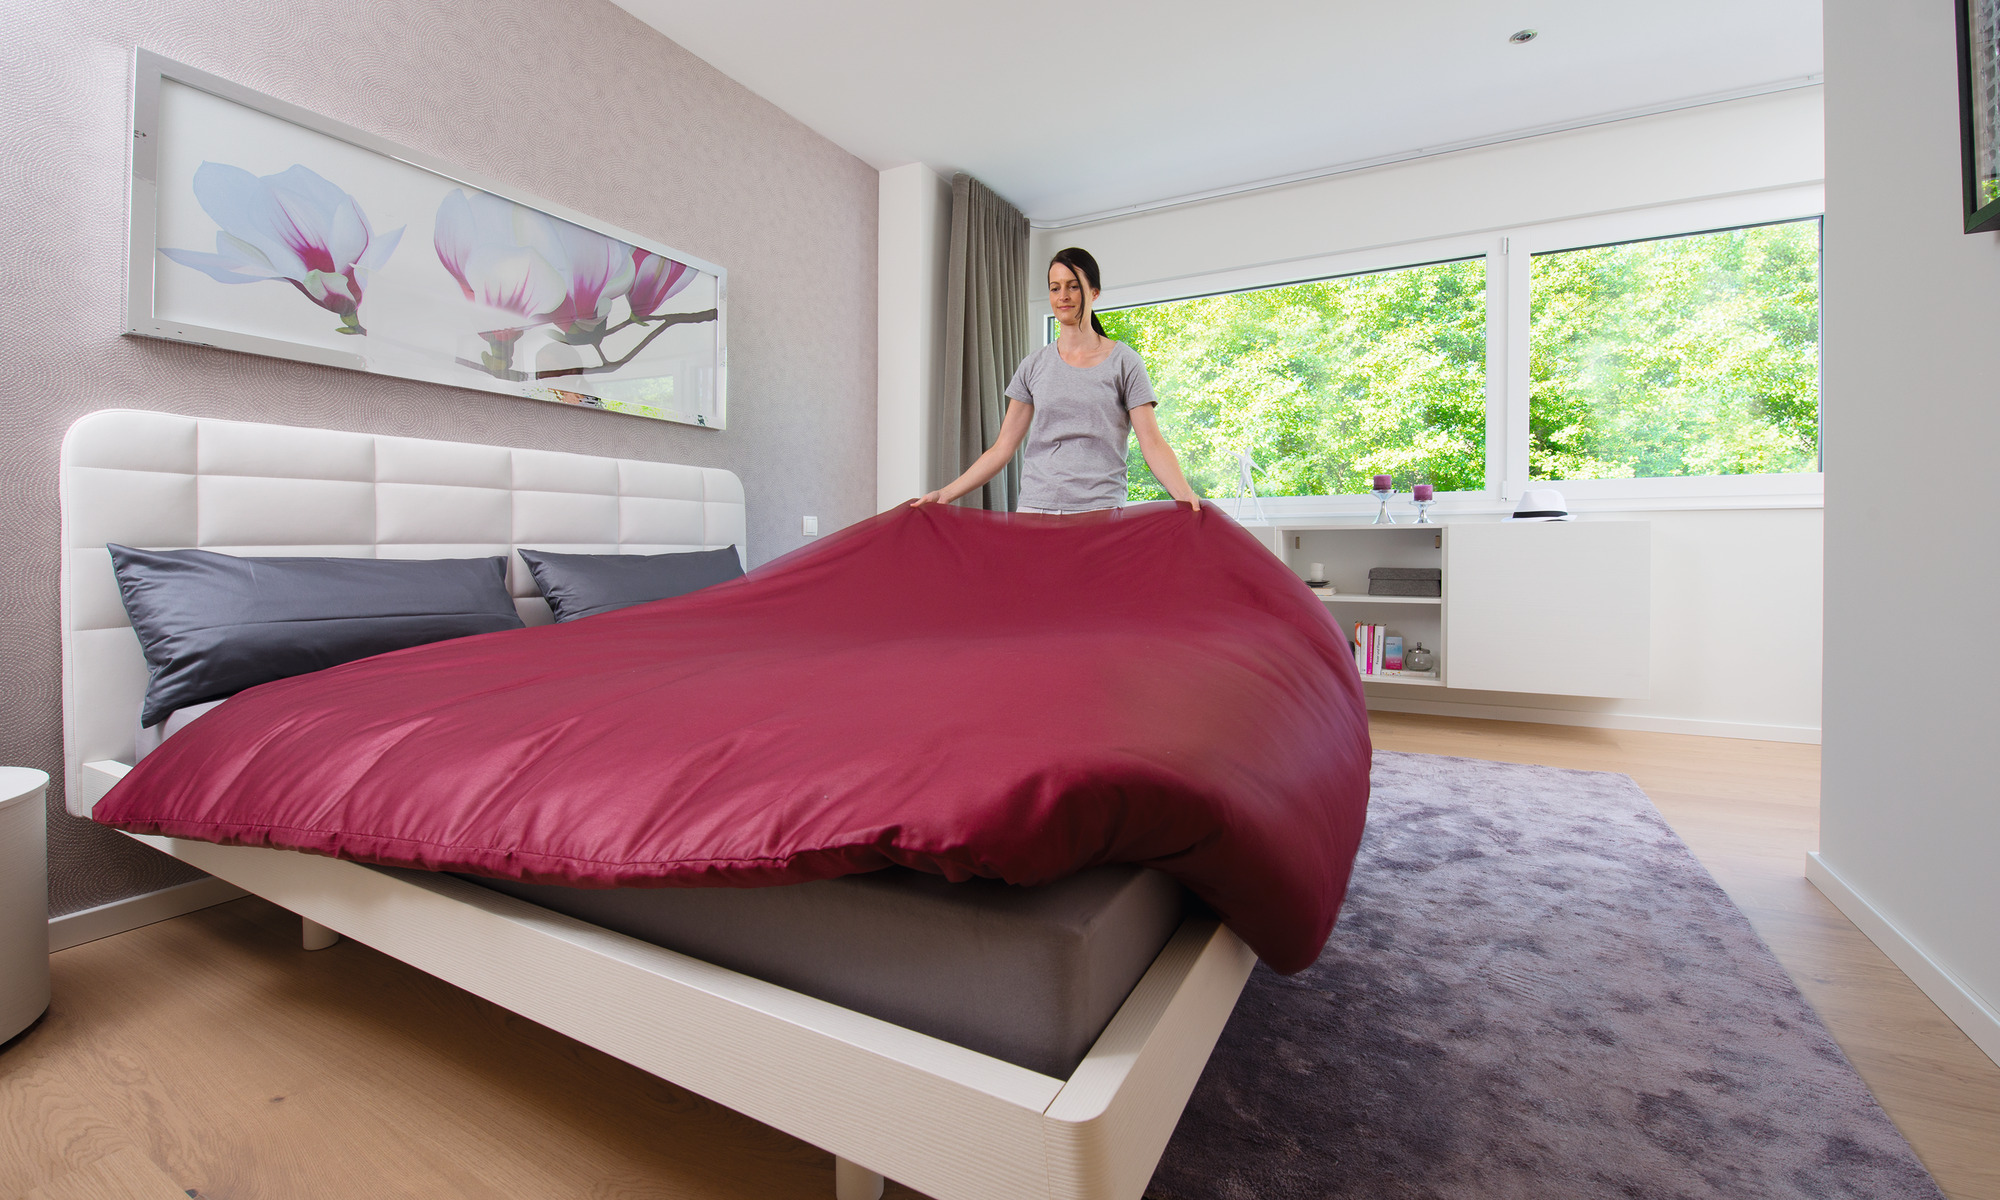 Contemporary, eco-friendly prefabricated house`